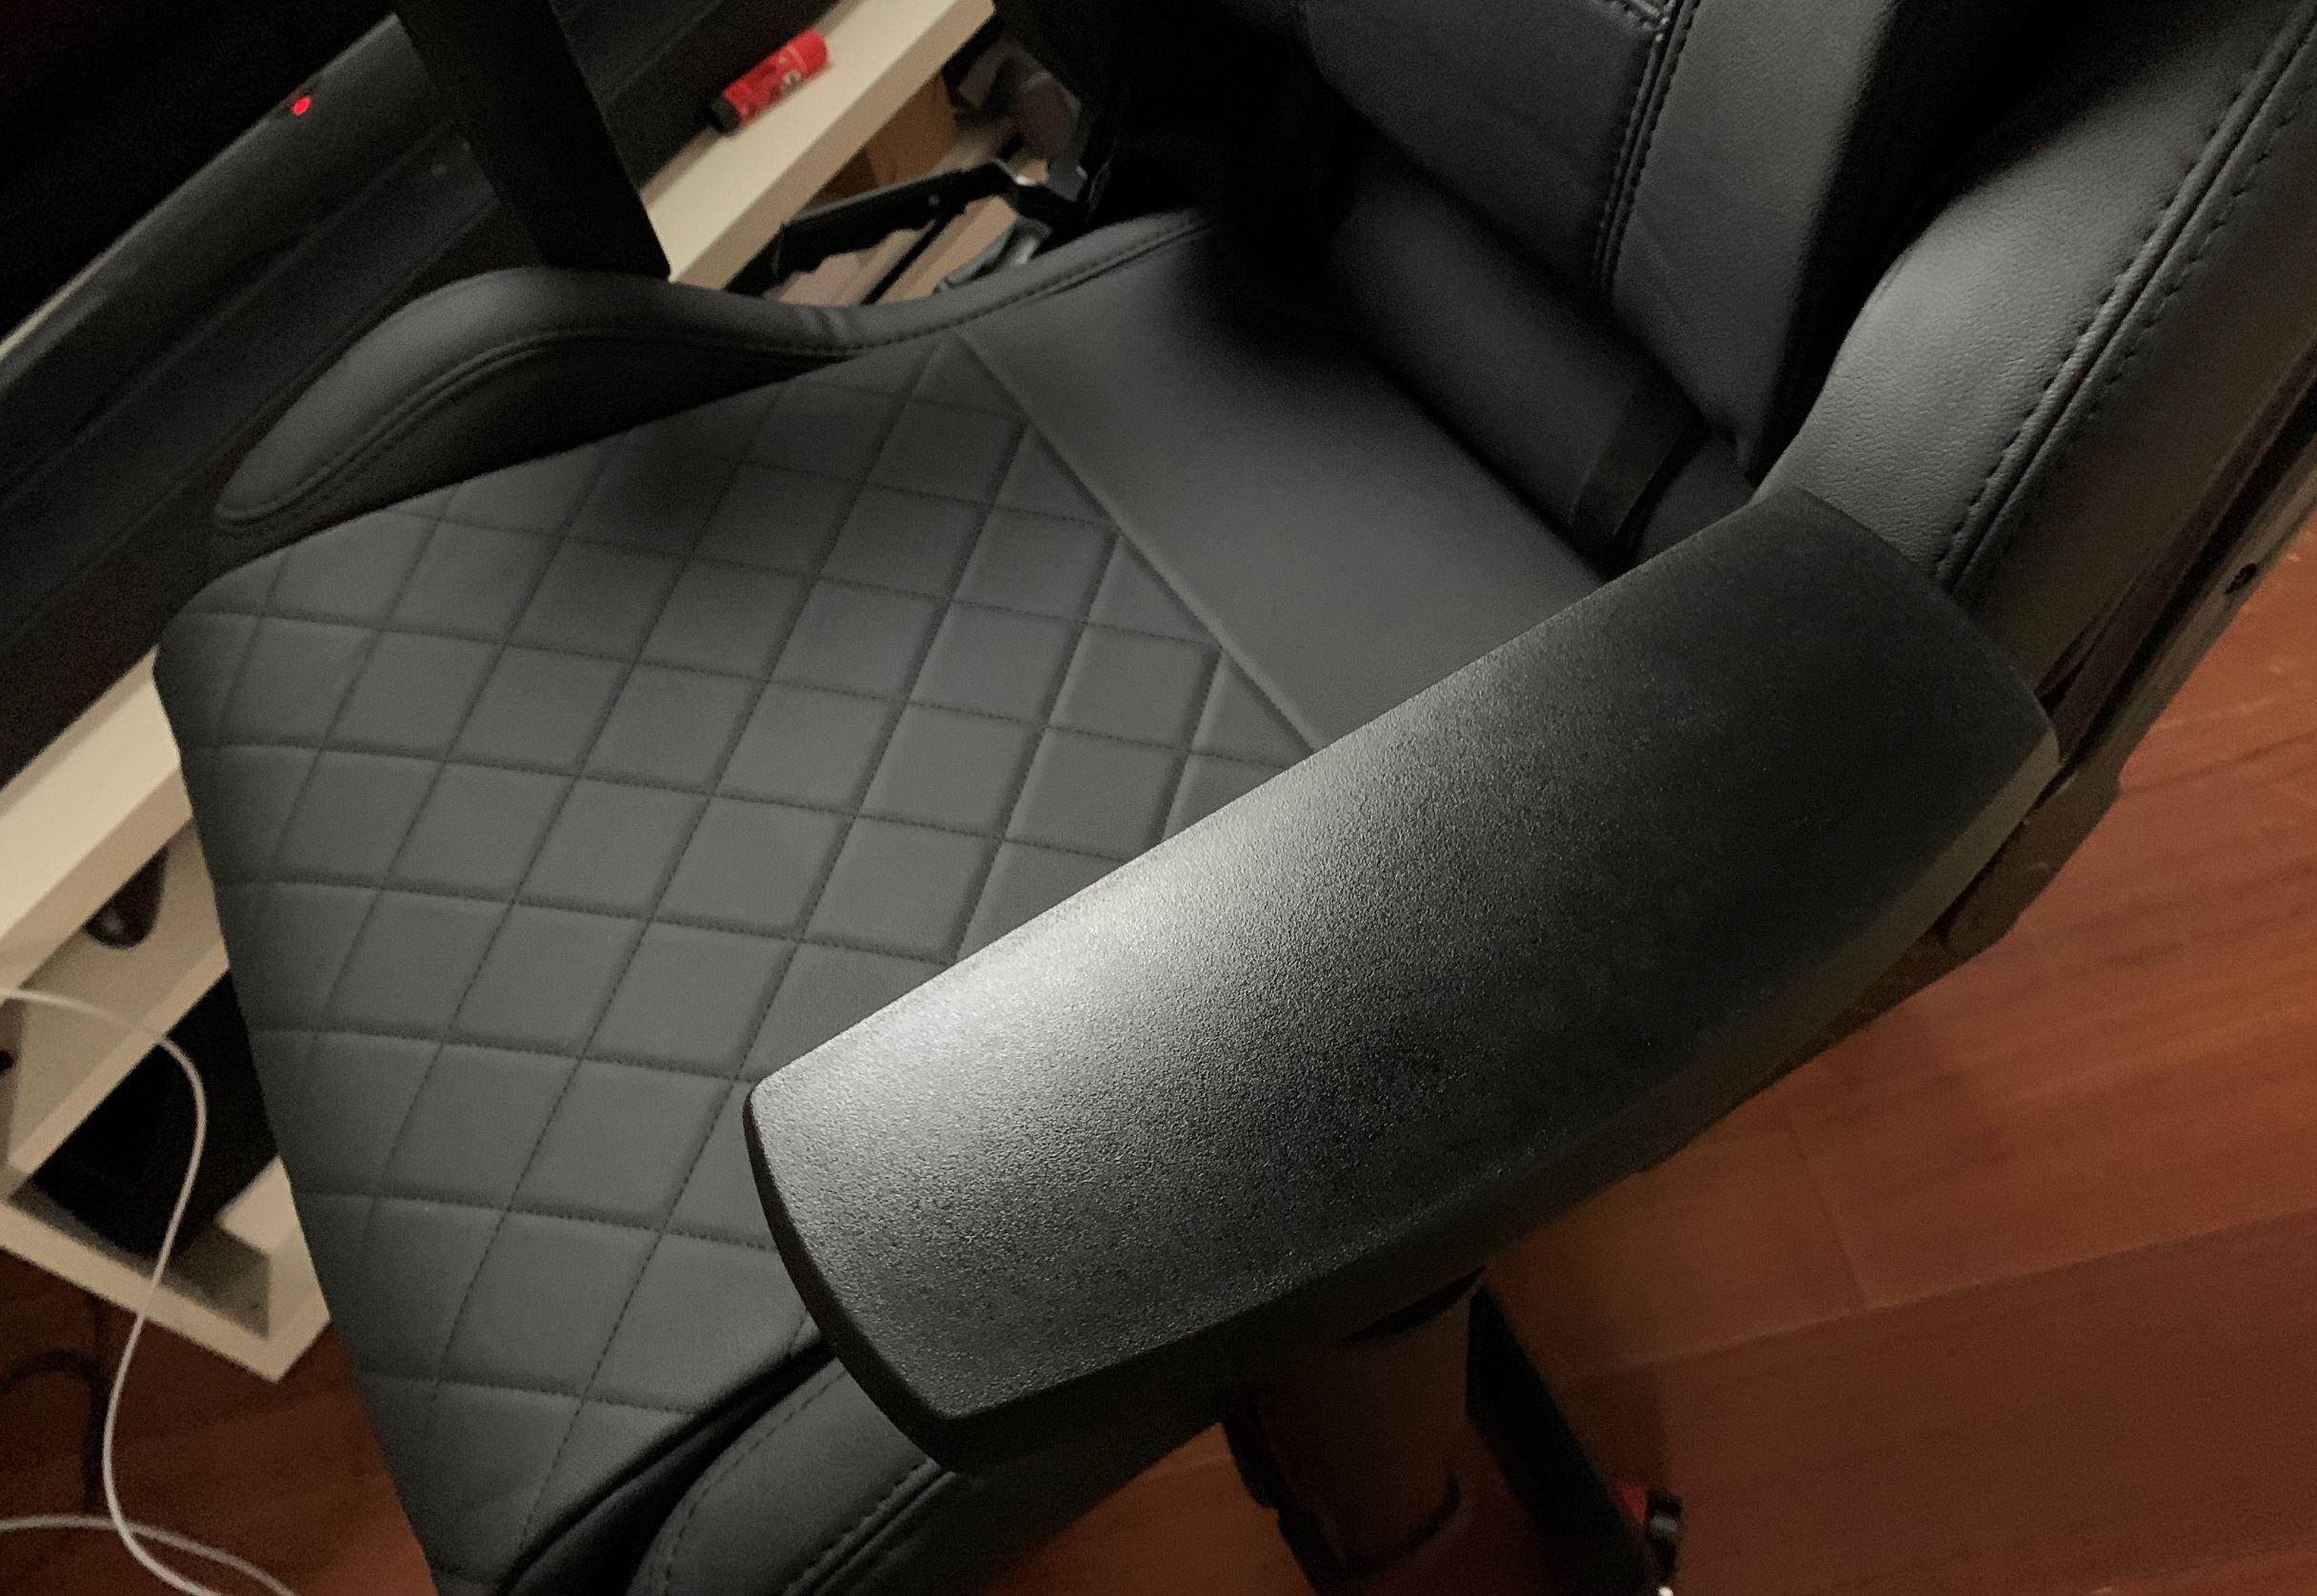 OMEN Citadel Gaming Chair